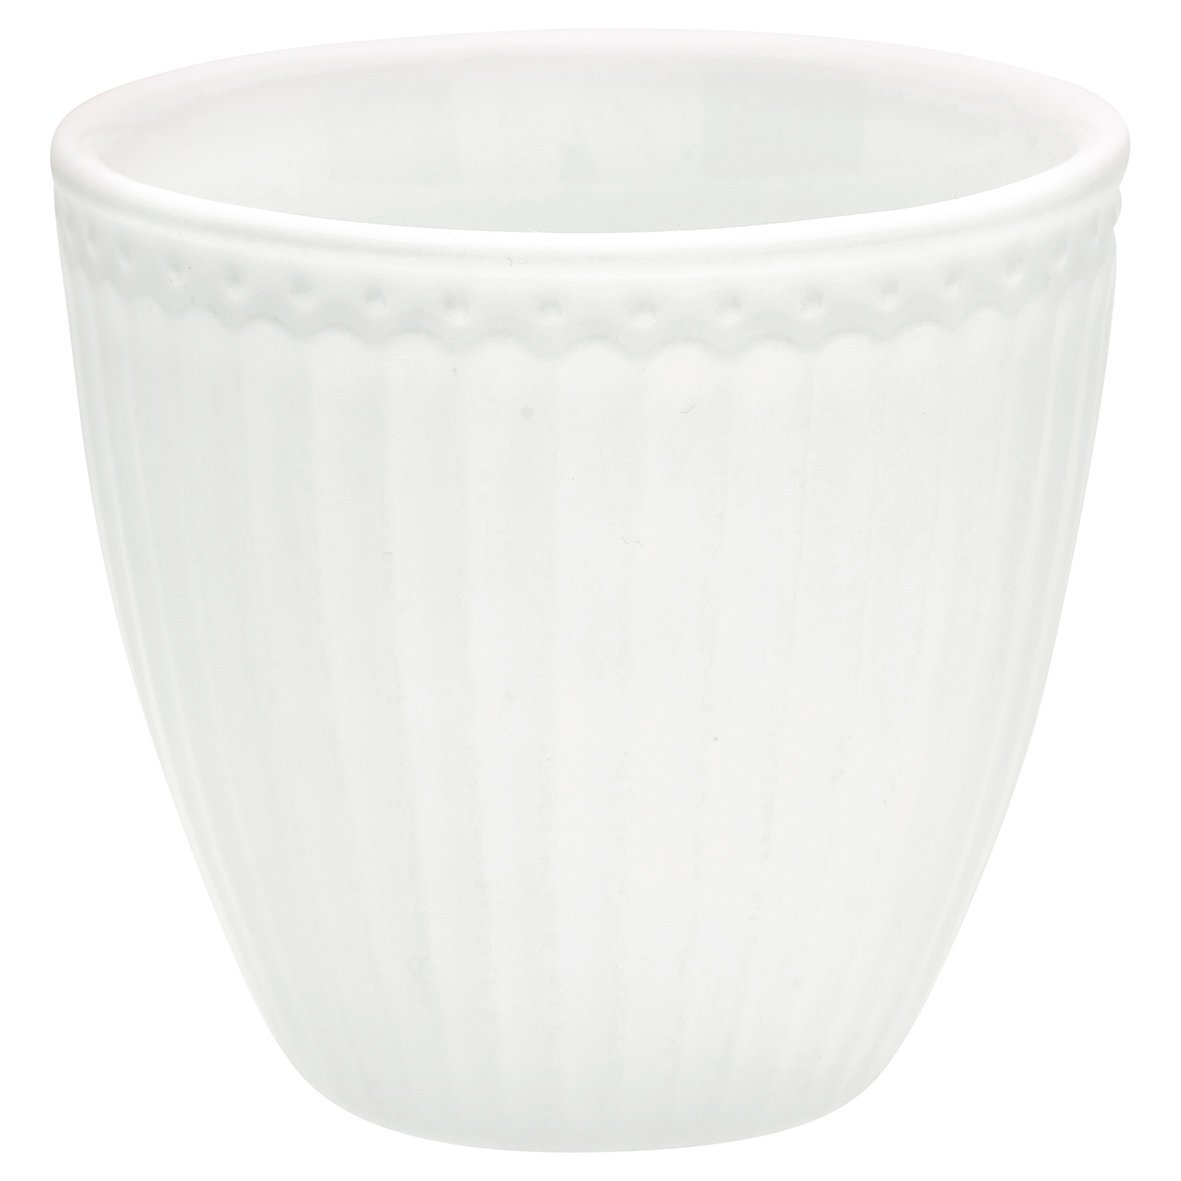 GreenGate Latte Tasse Alice